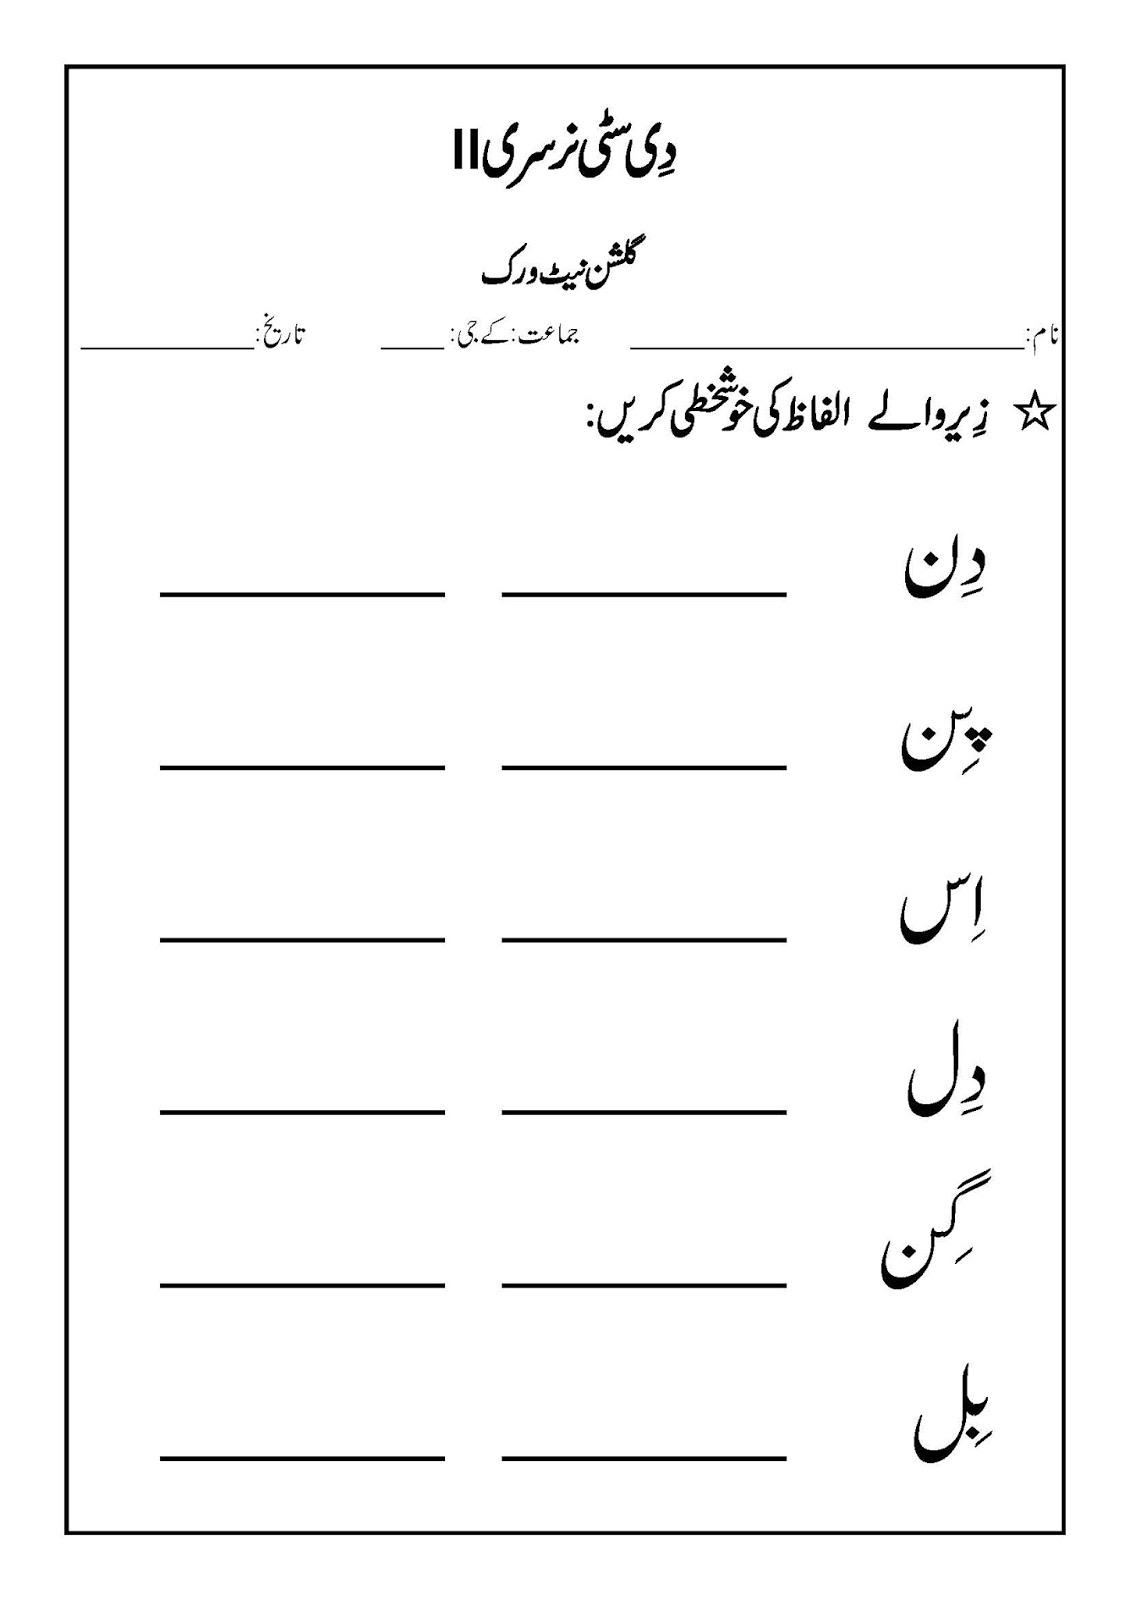 sr gulshan the city nursery ii urdu kuwa and english worksheets. Black Bedroom Furniture Sets. Home Design Ideas